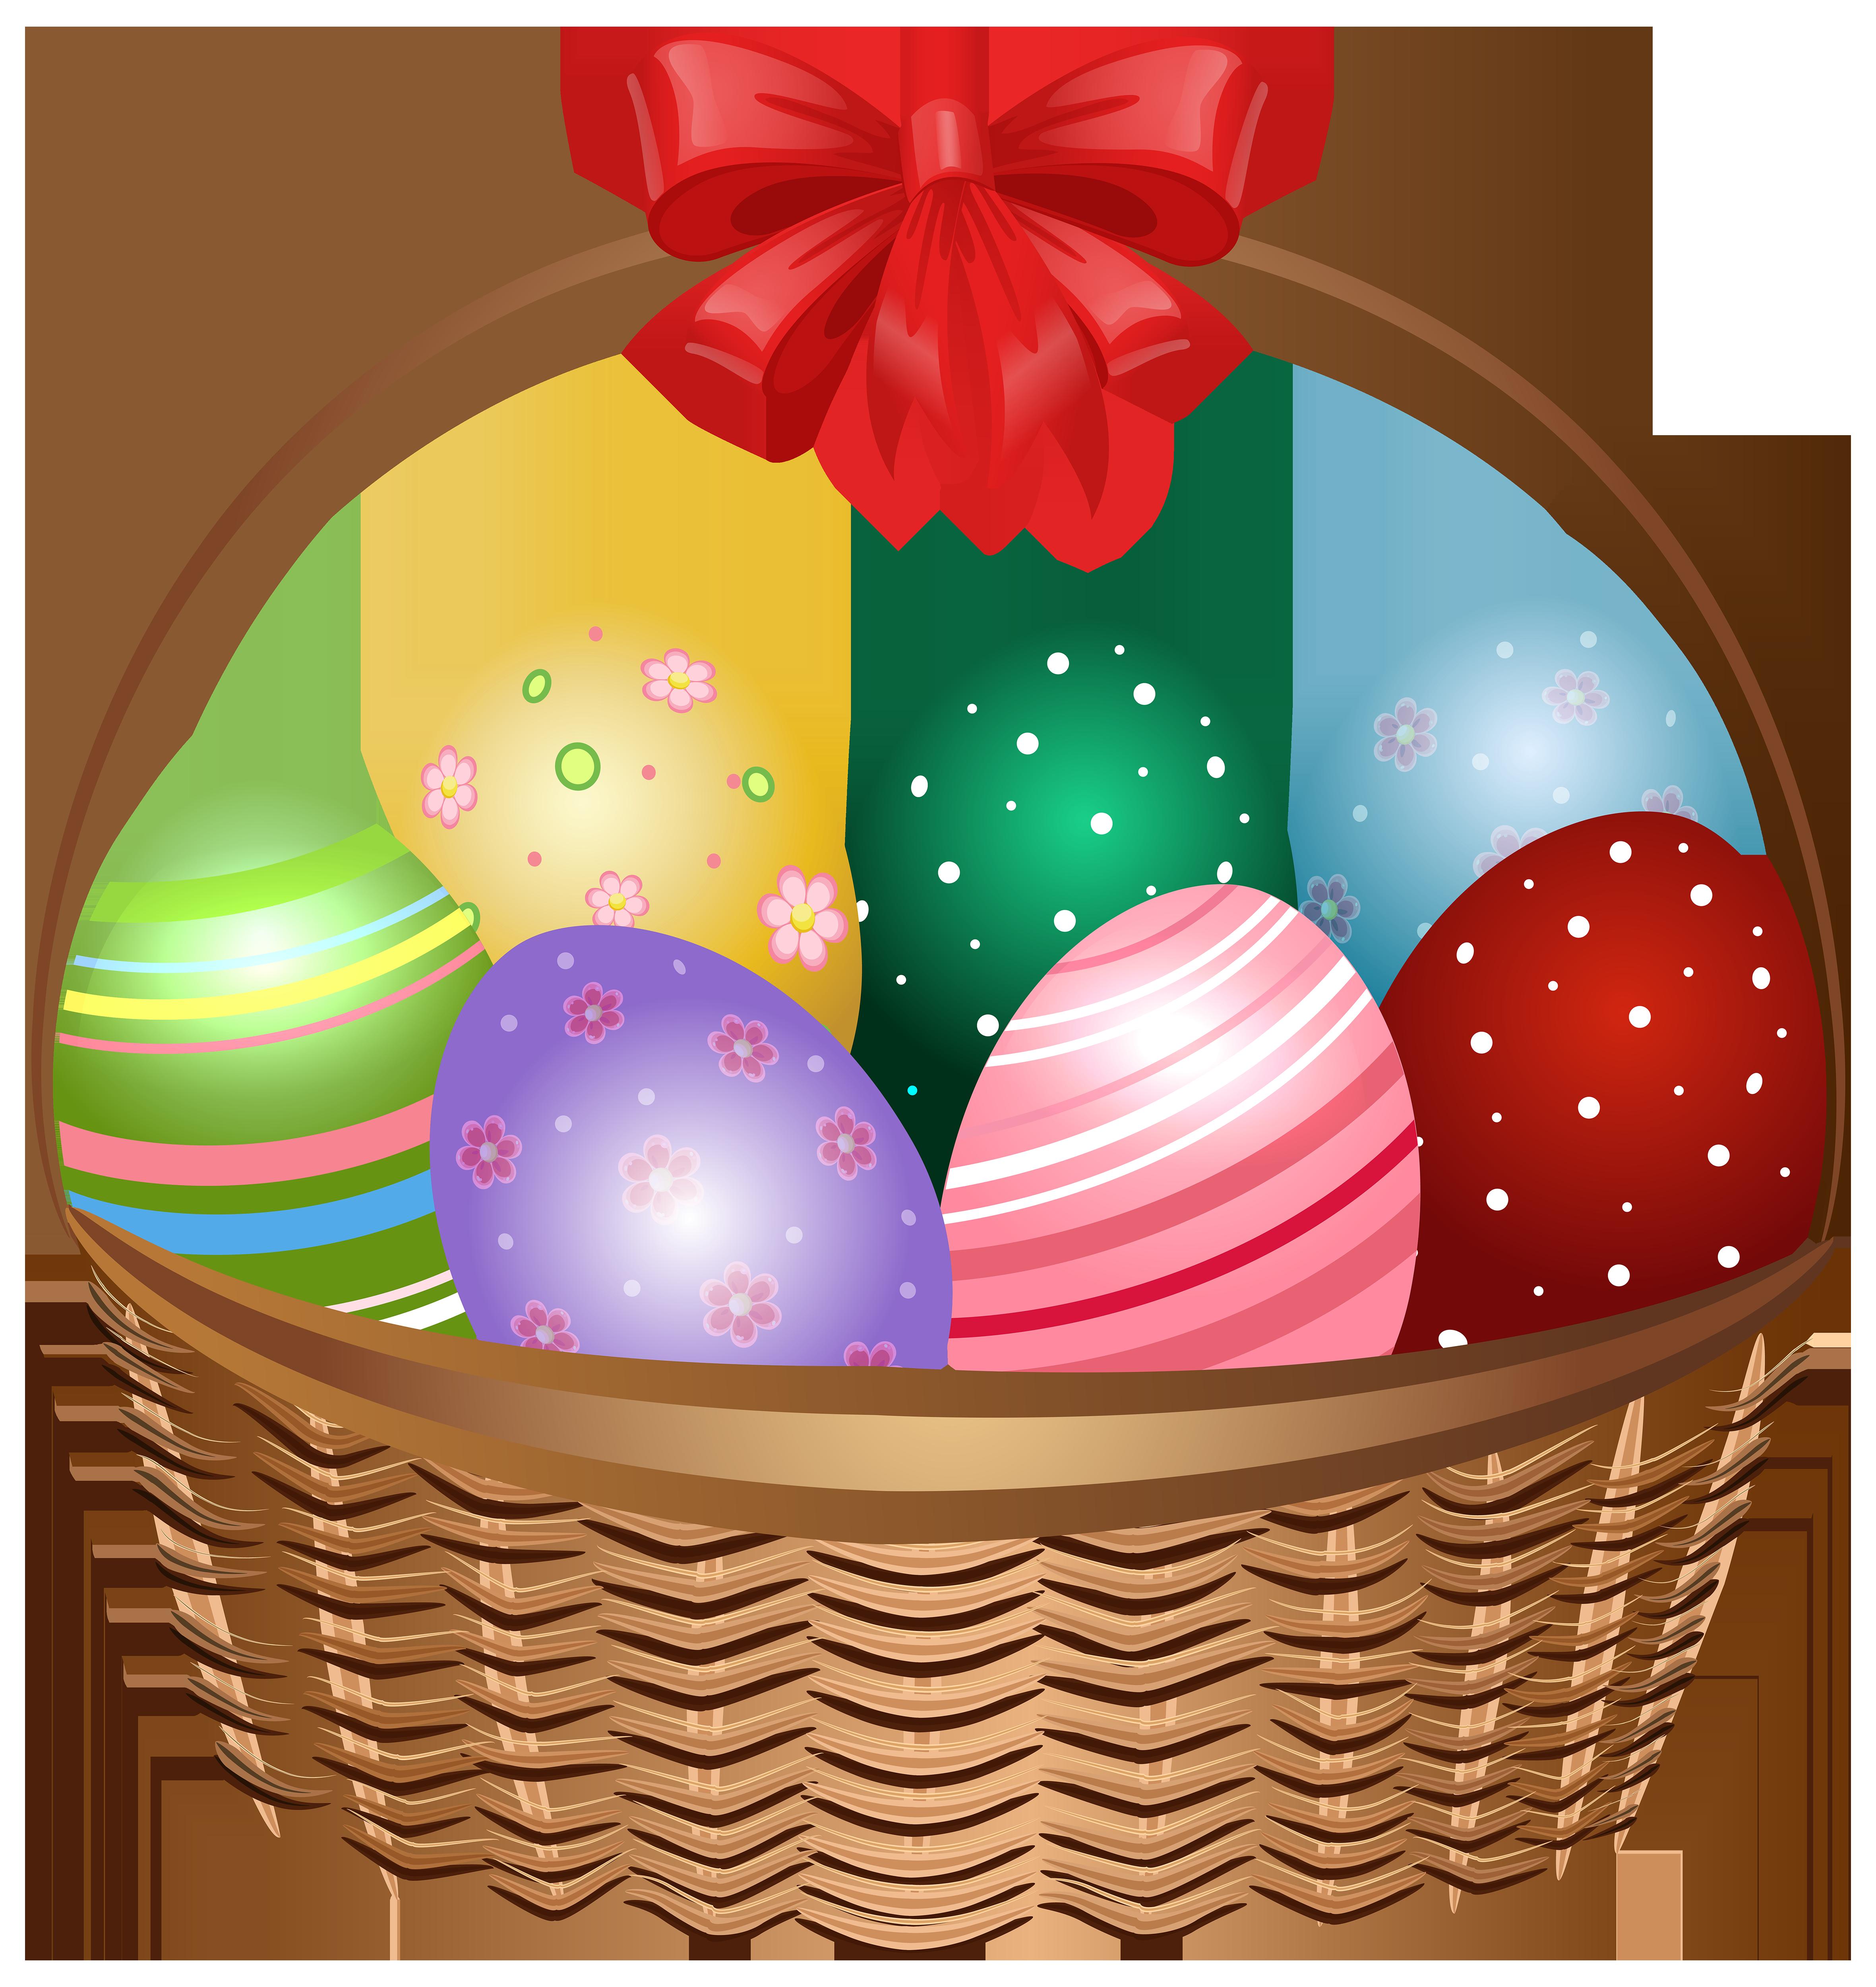 Easter clip art image. Water clipart basket